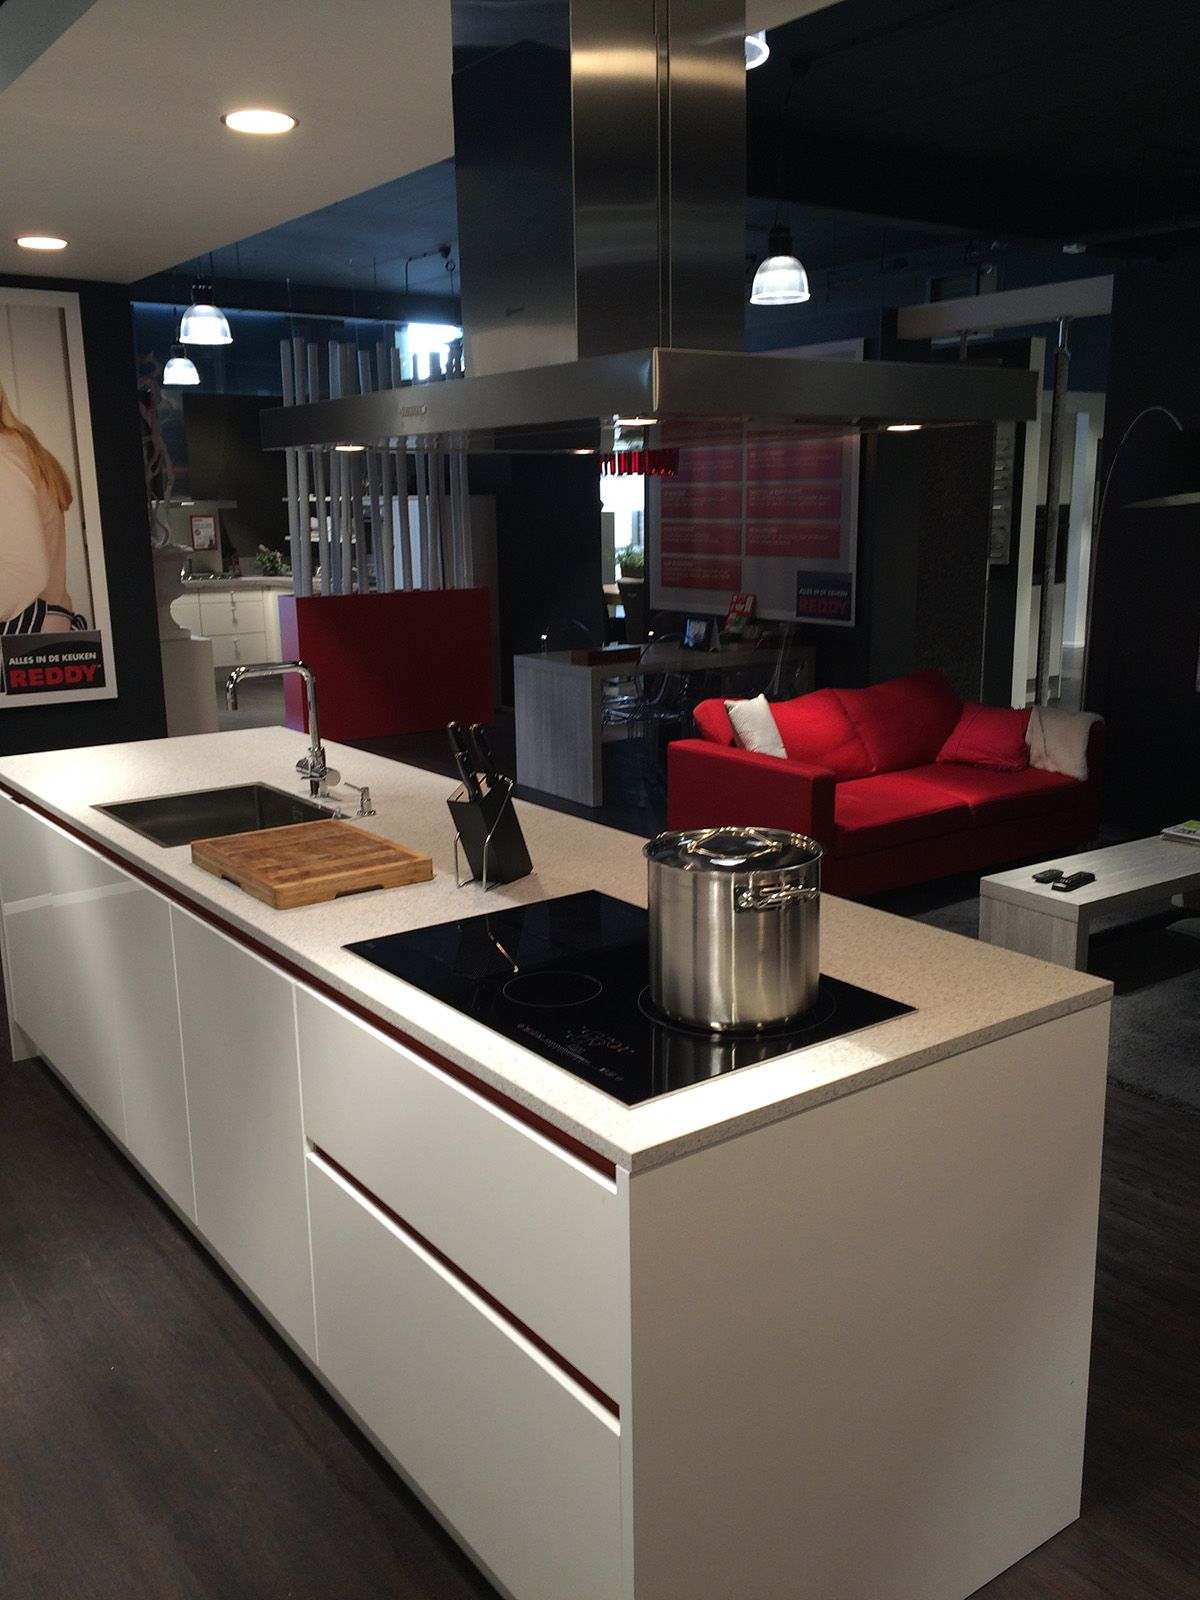 Waterkraan Keuken : .nl Het grootste keukenaanbod van Nederland Eiland keuken [50185